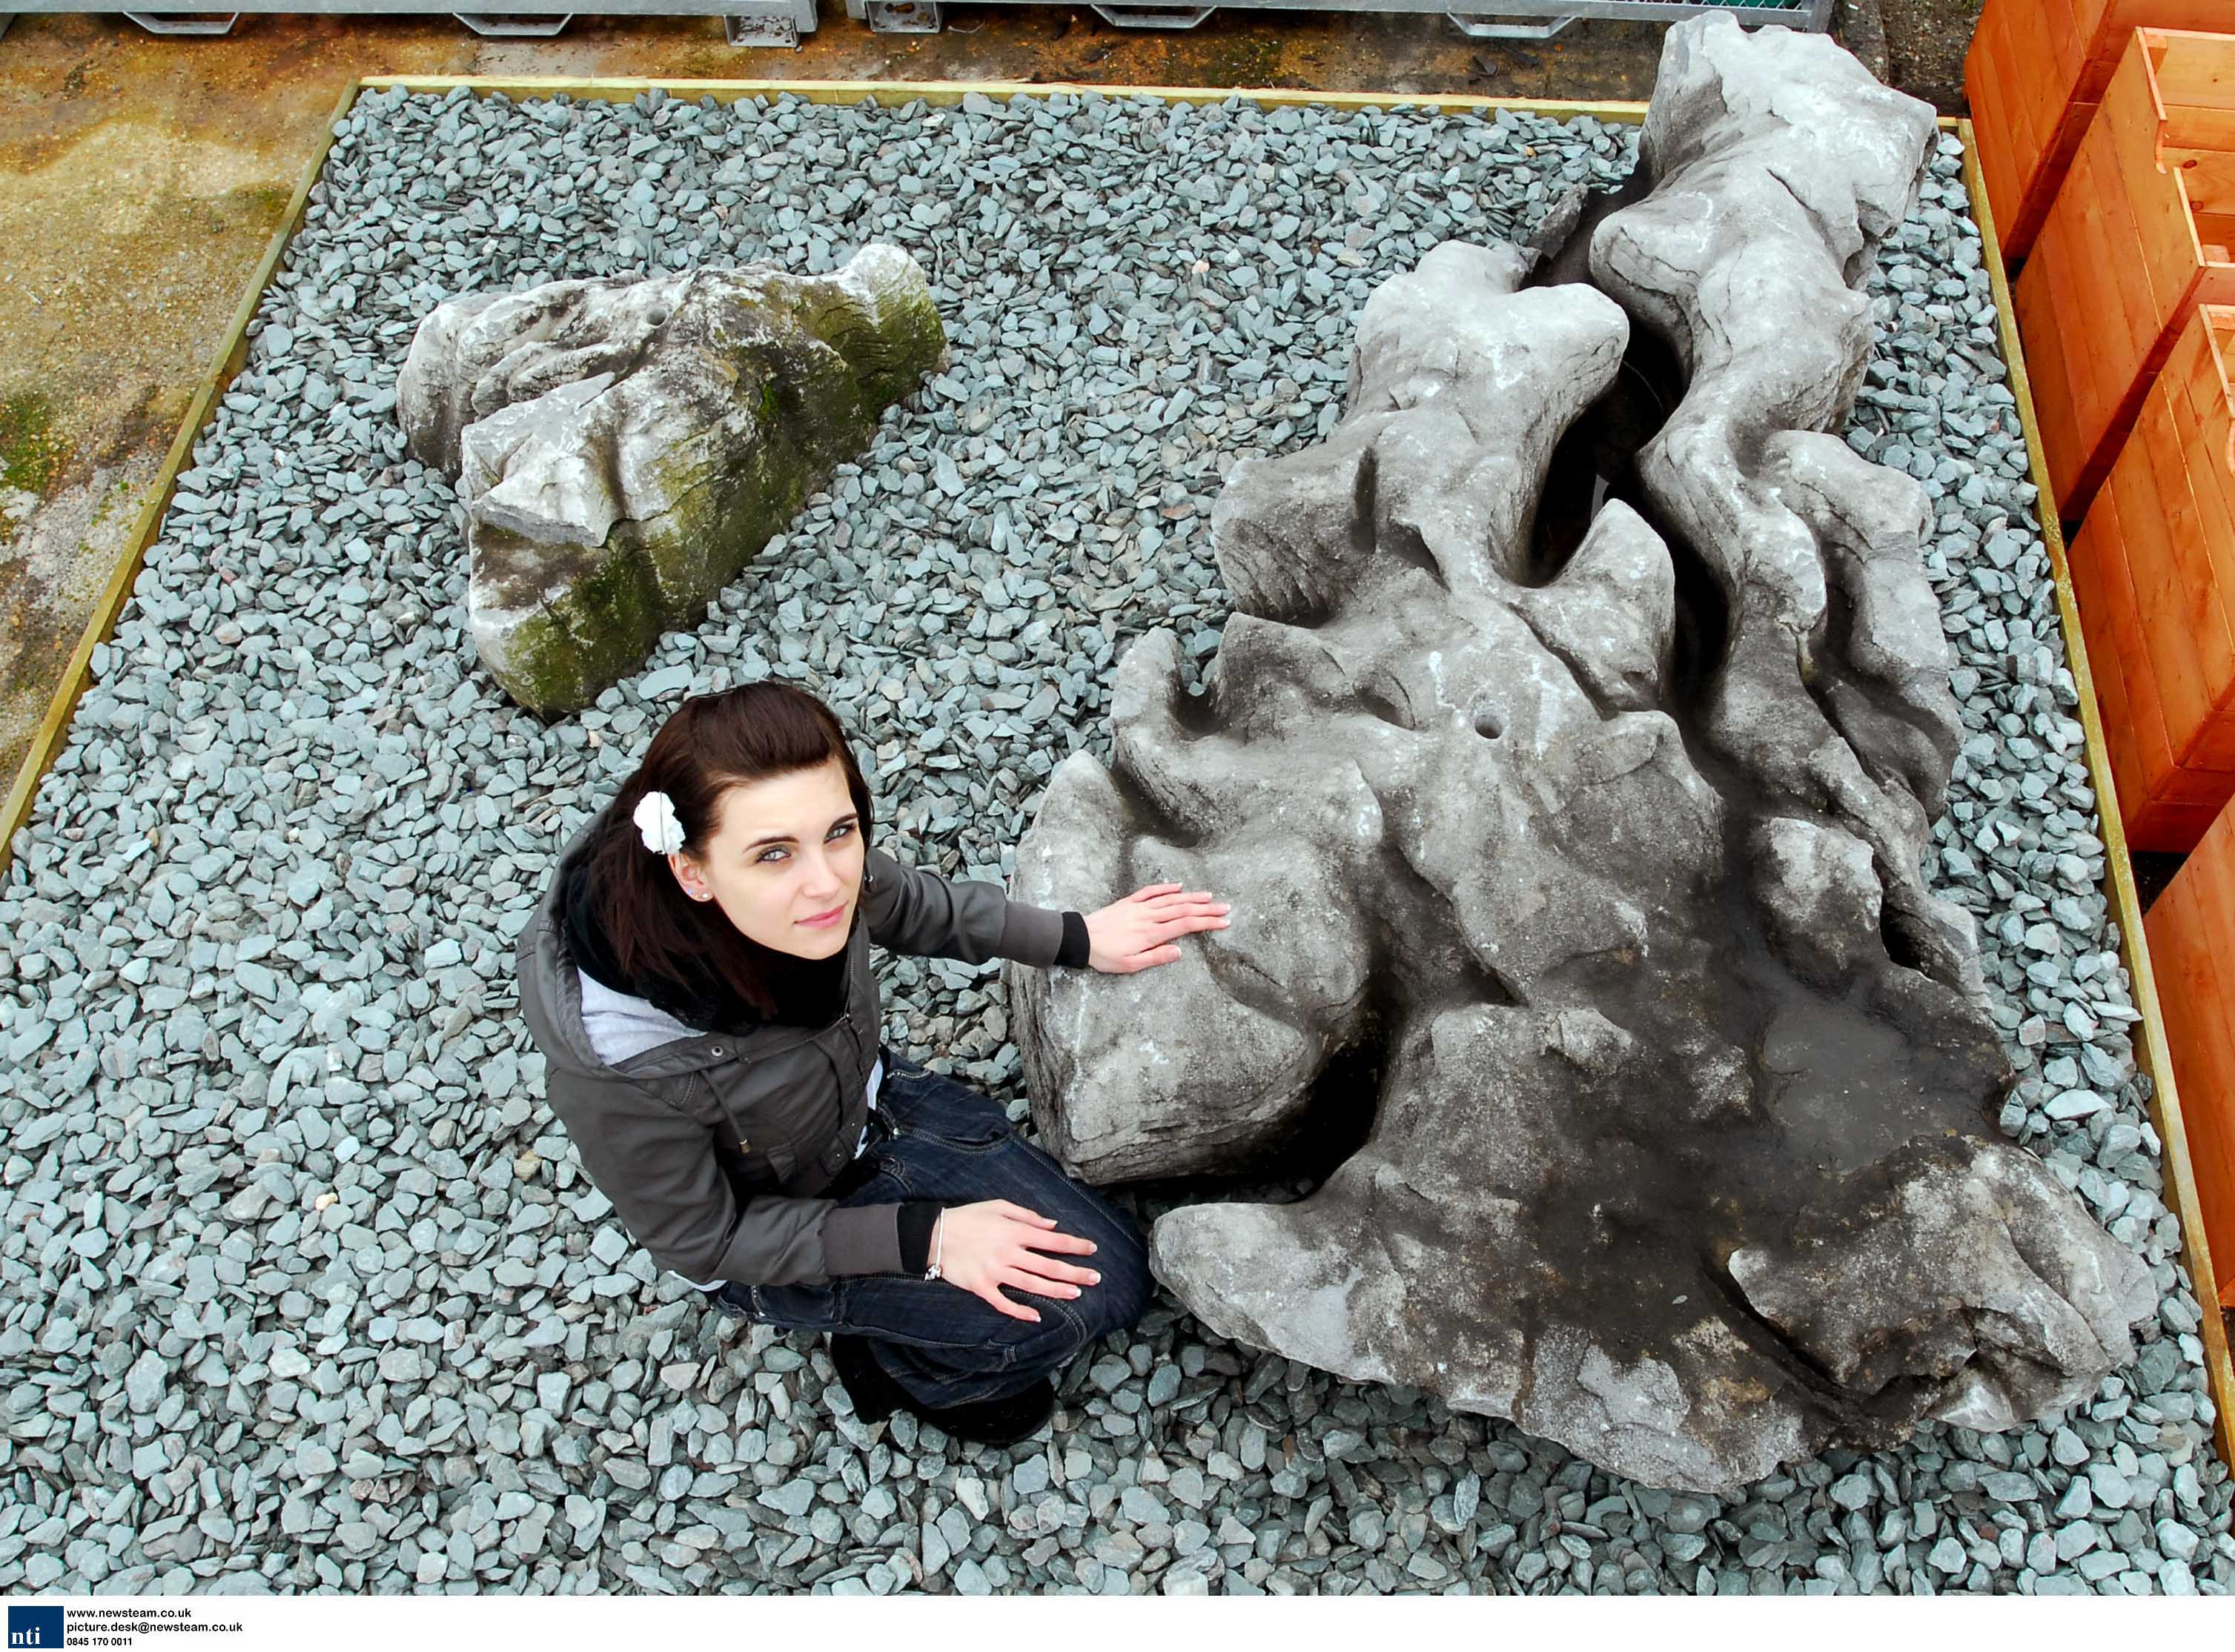 Rock naturally shaped like the UK